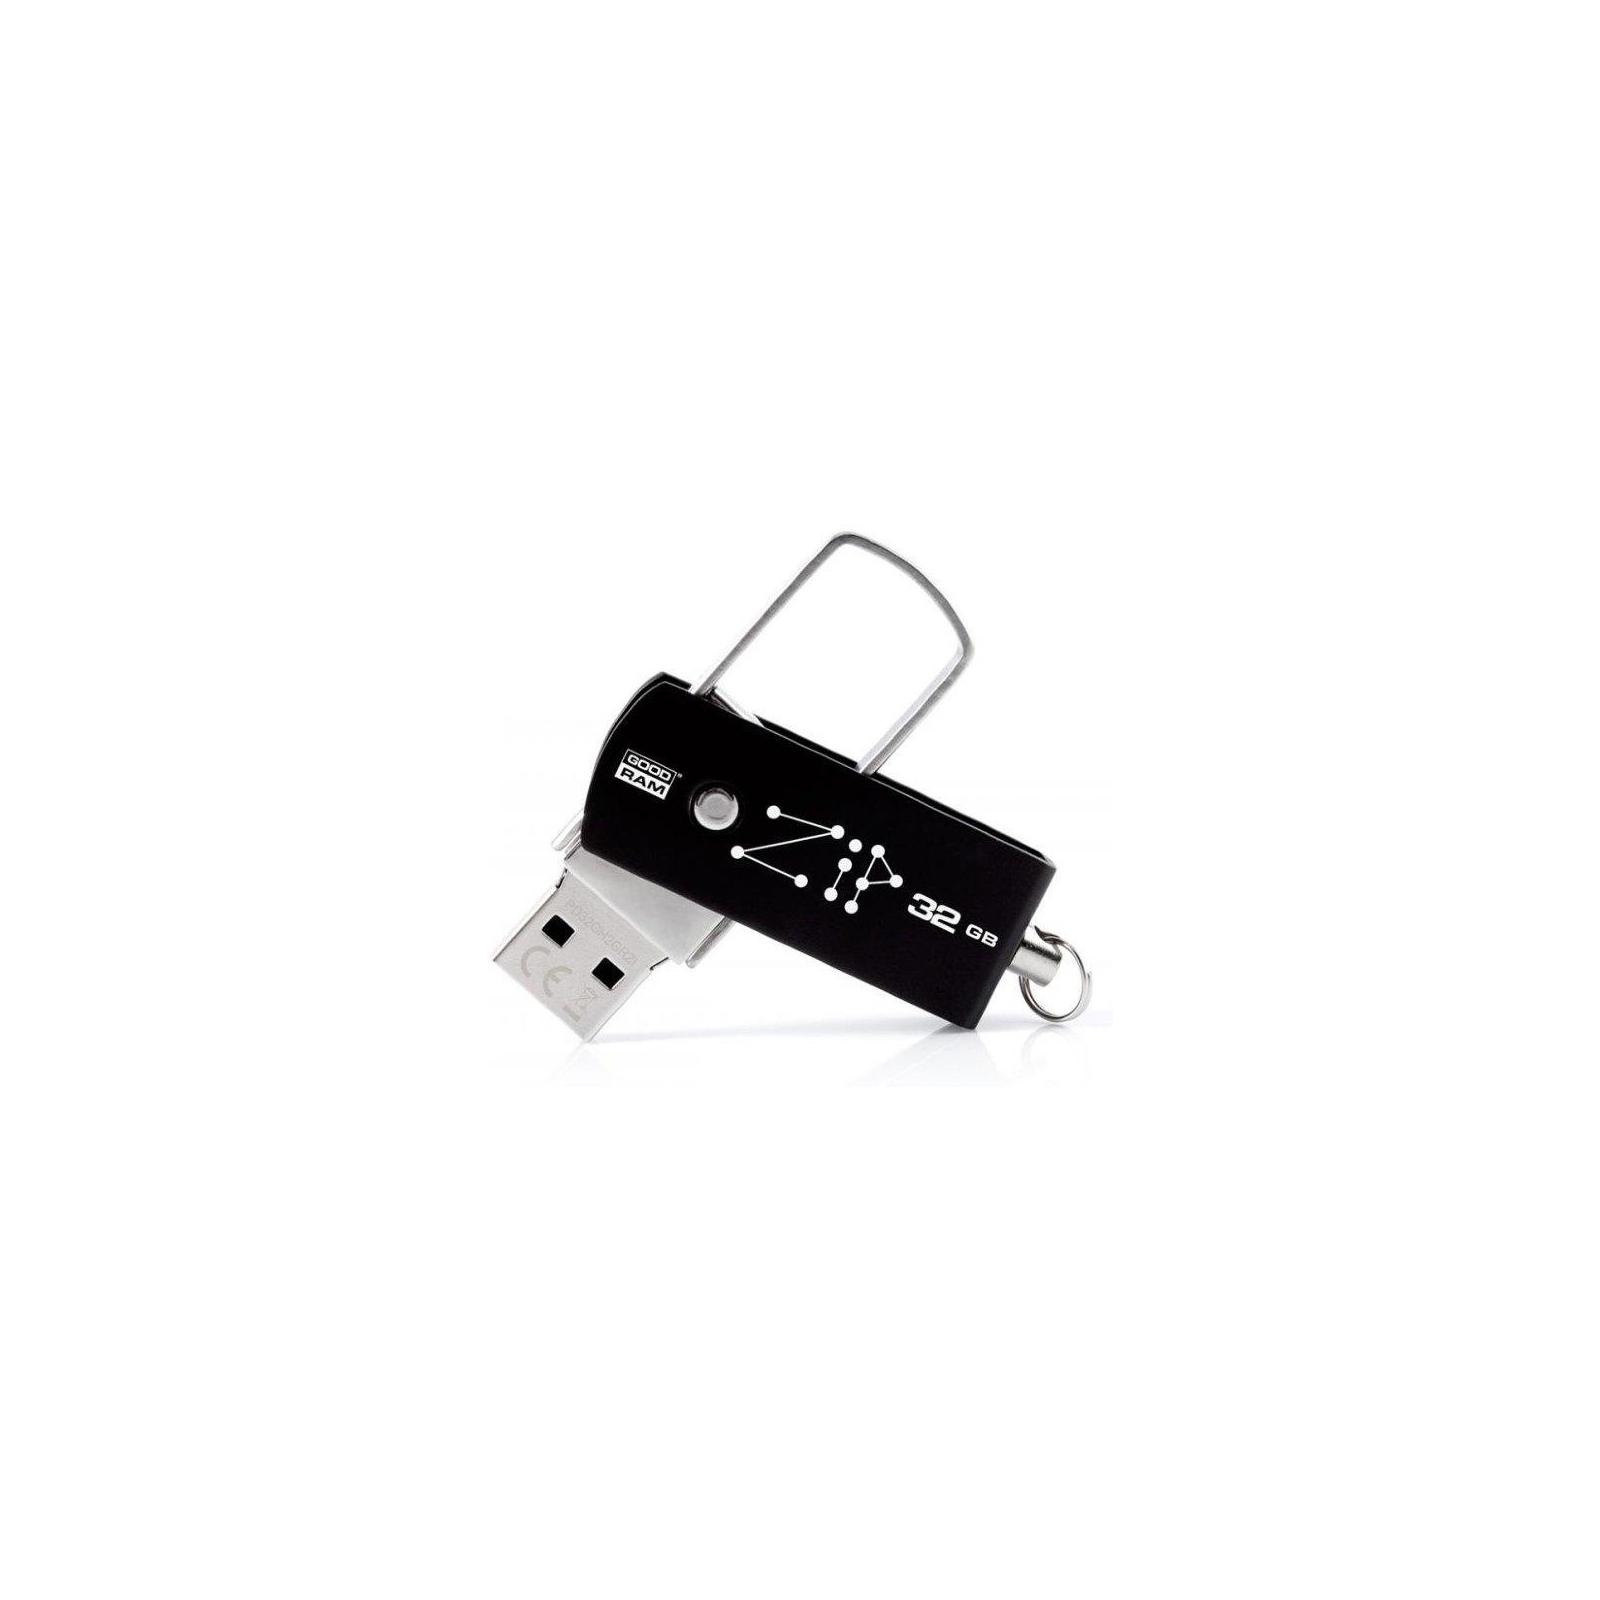 USB флеш накопитель GOODRAM 32GB Zip Black USB 2.0 (PD32GH2GRZIKR9) изображение 2